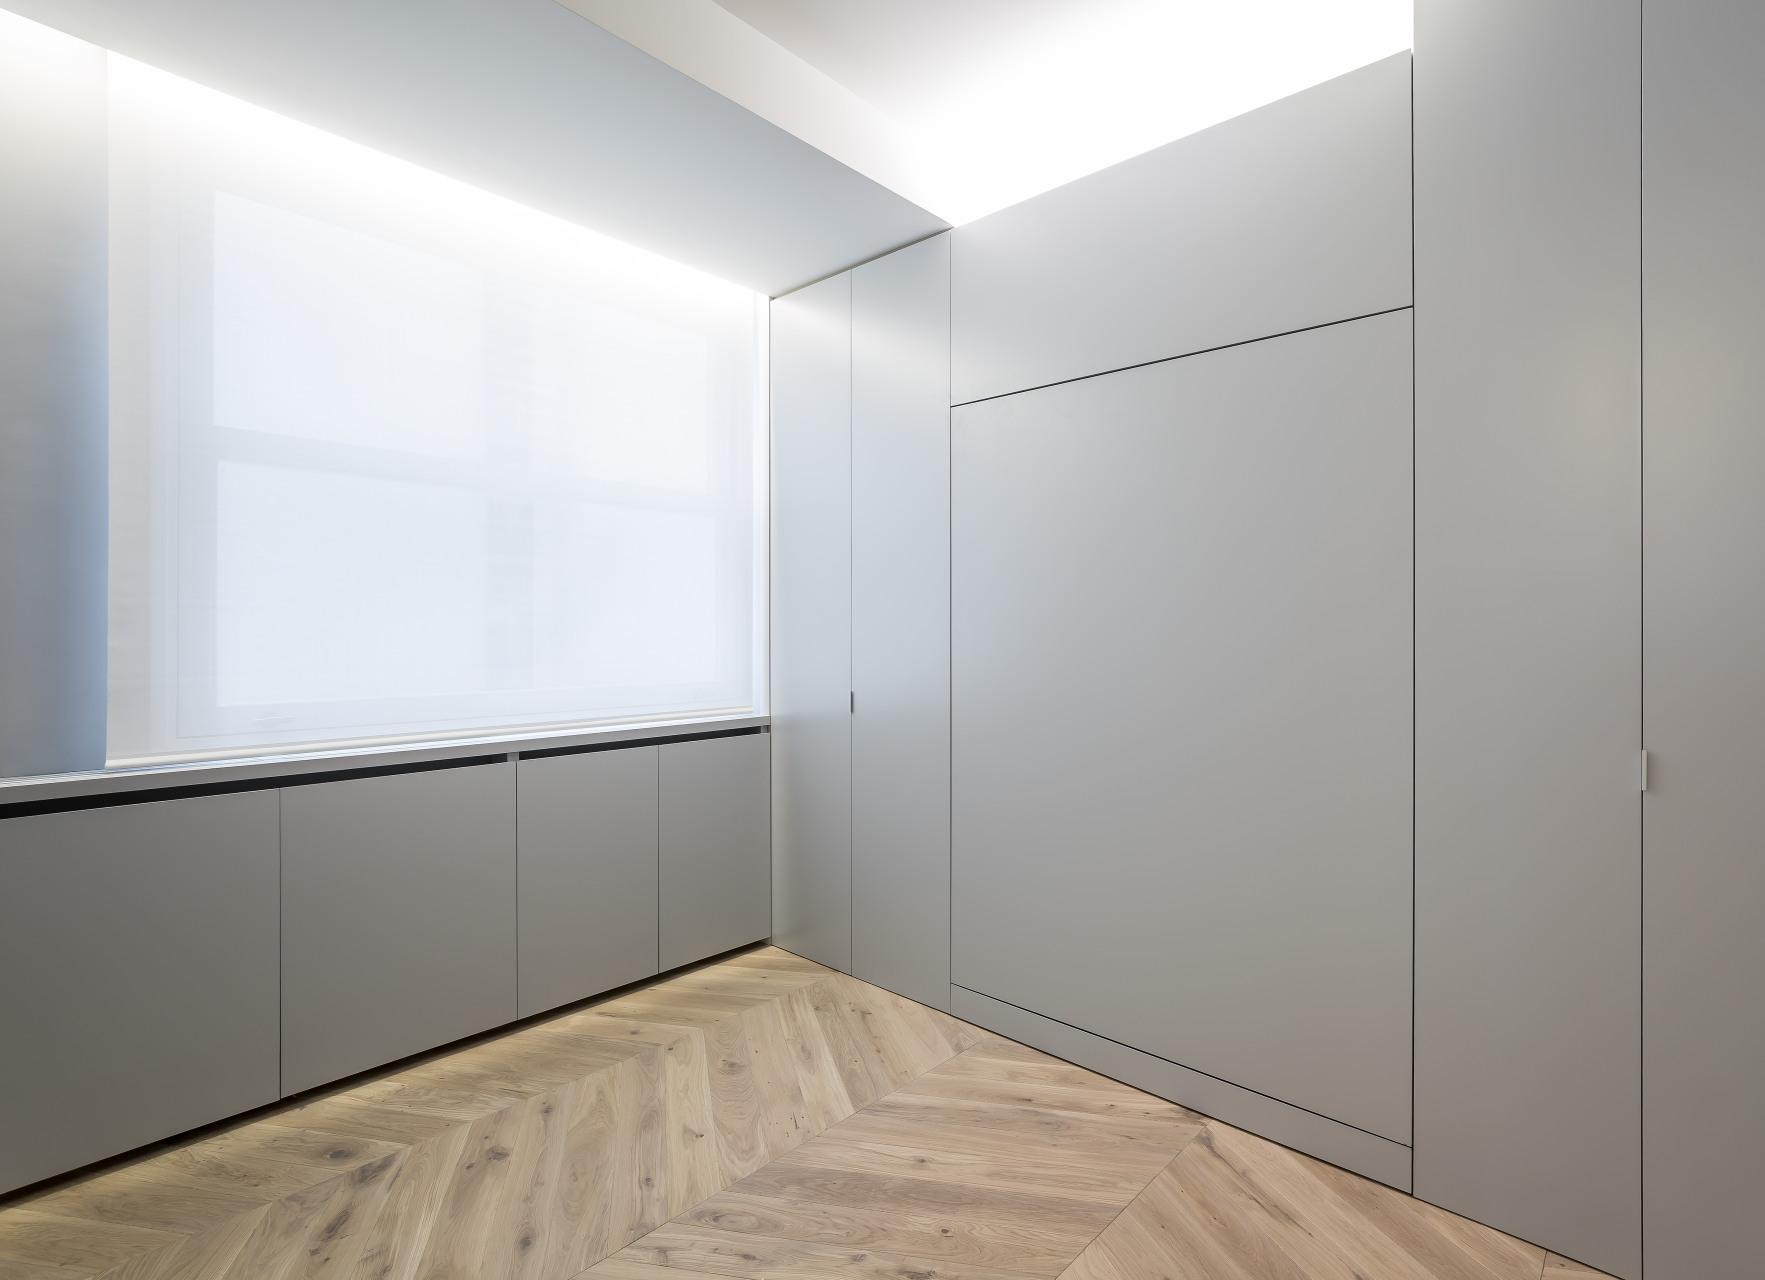 fotografia-arquitectura-valencia-german-cabo-gallardo-llopis-bfm-edificatoria-turia01 (5)